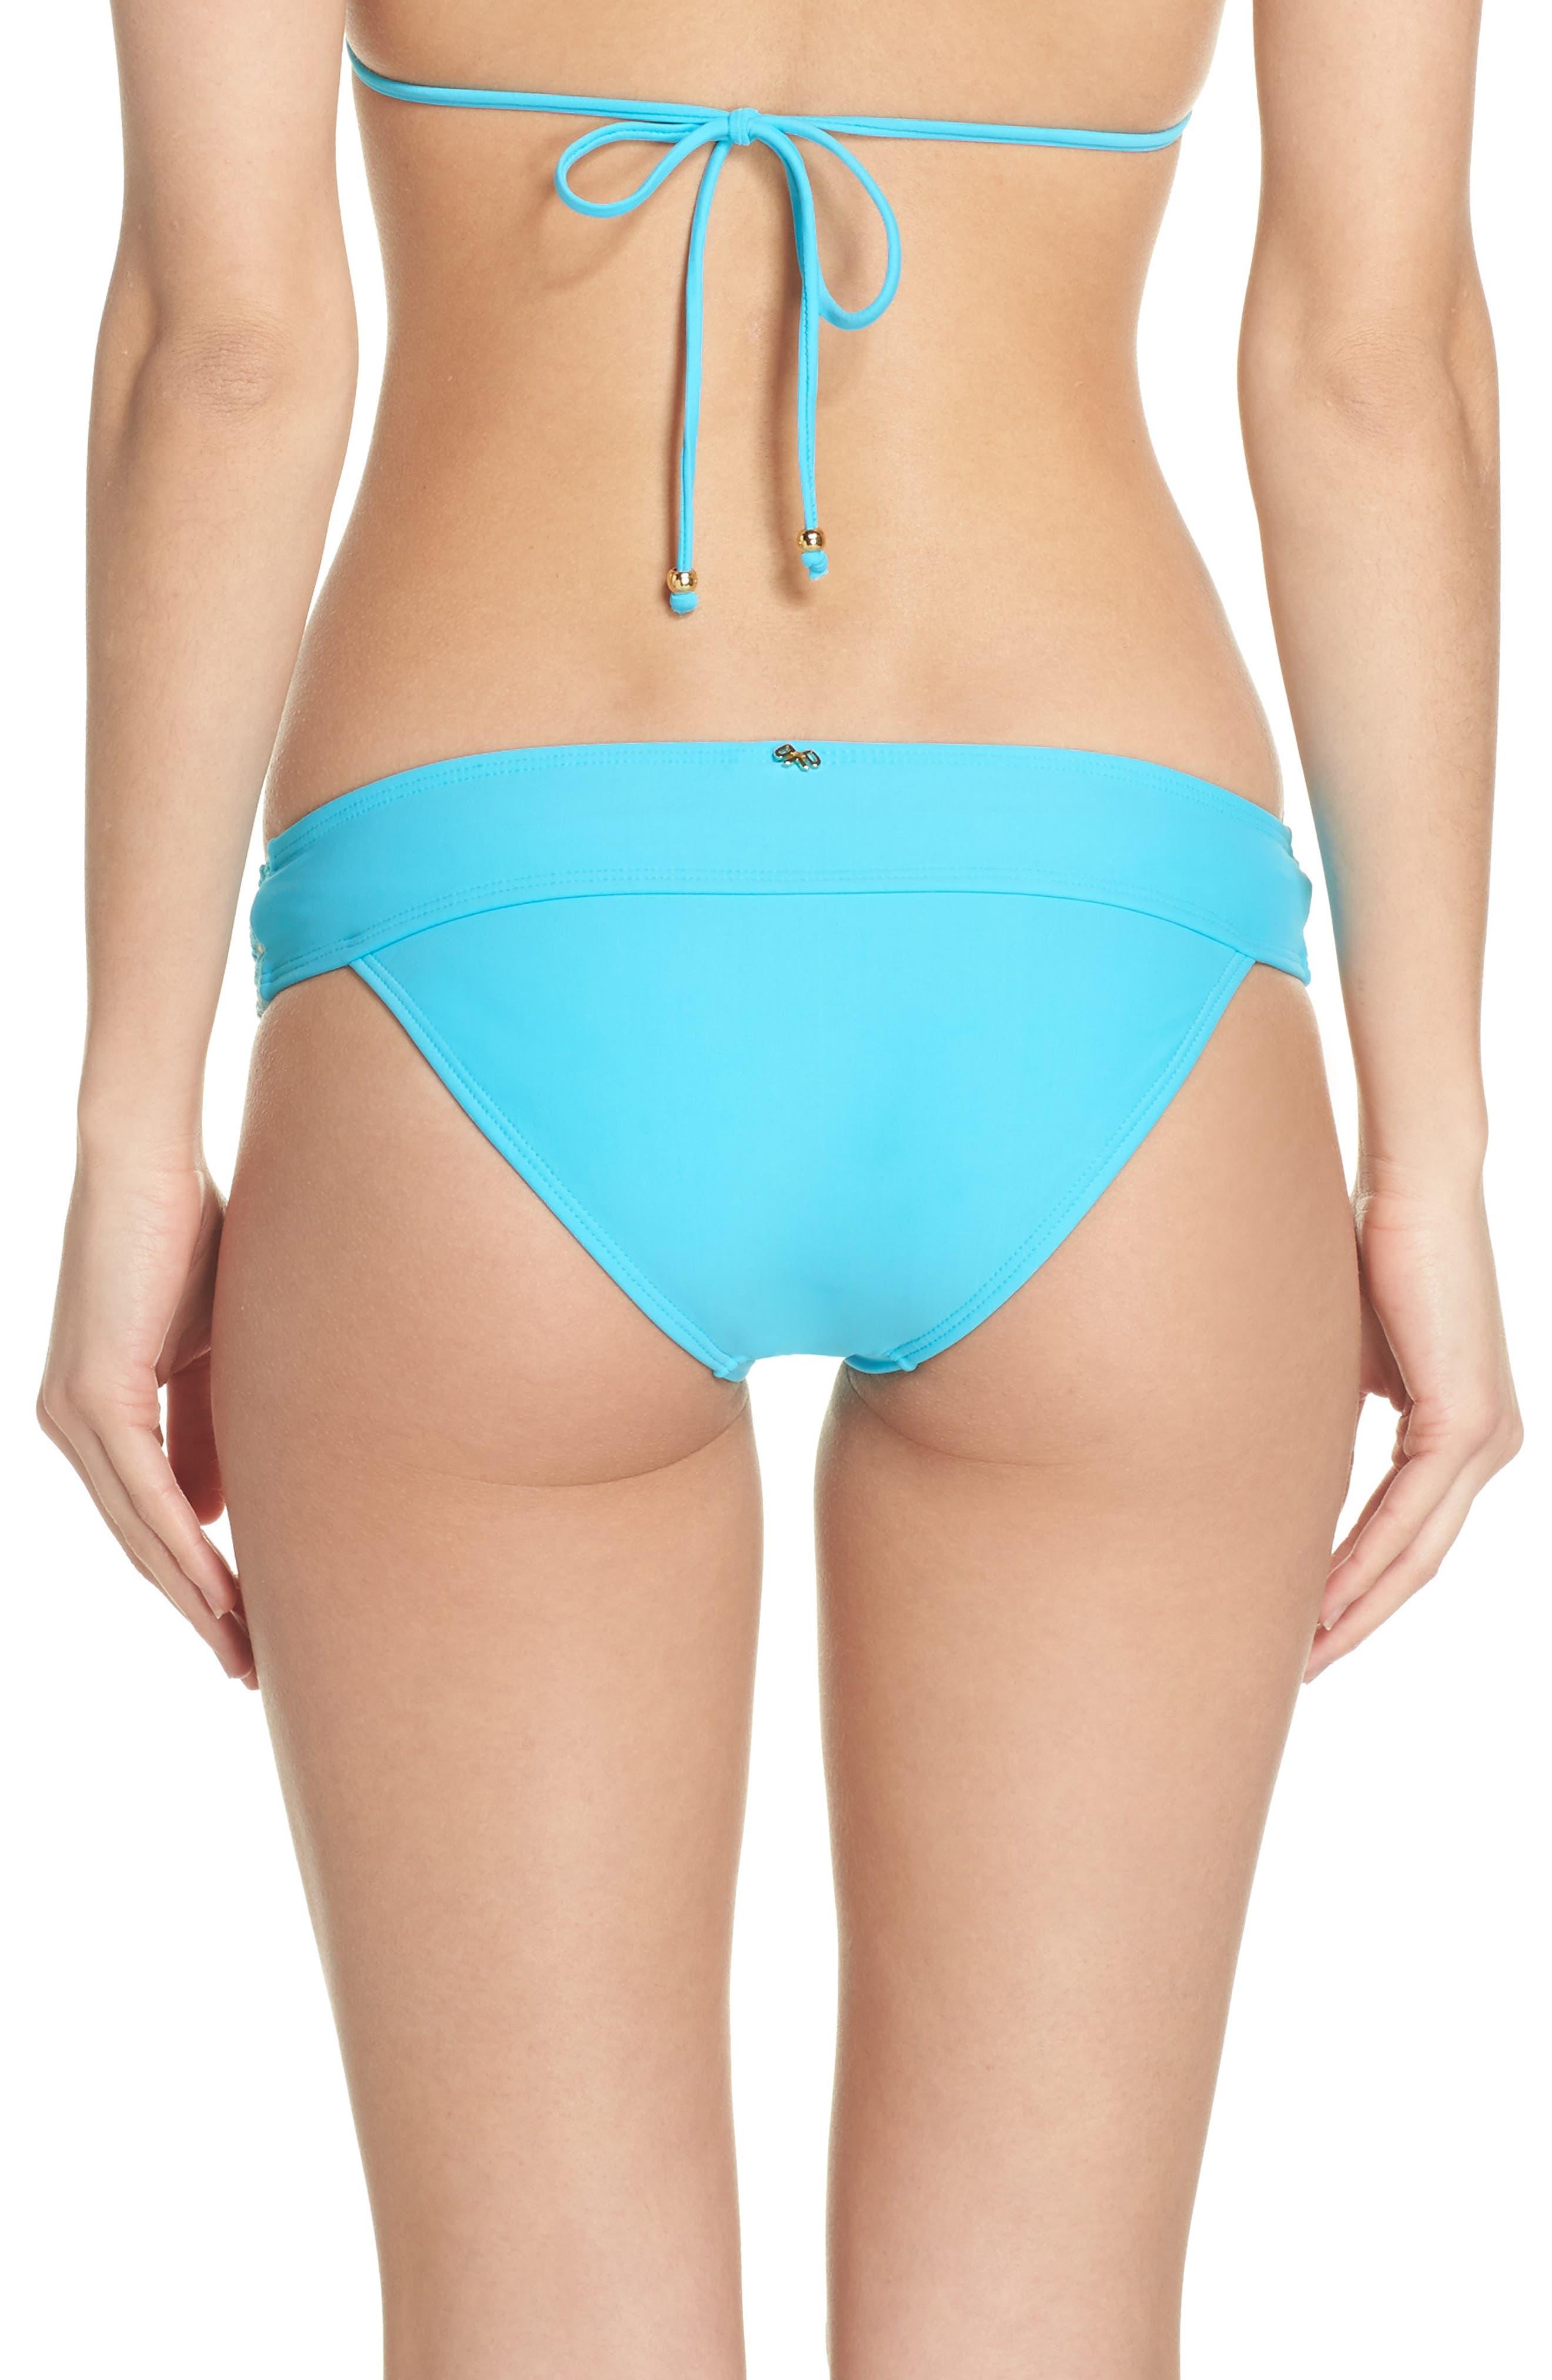 Banded Lace Bikini Bottoms,                             Alternate thumbnail 2, color,                             415